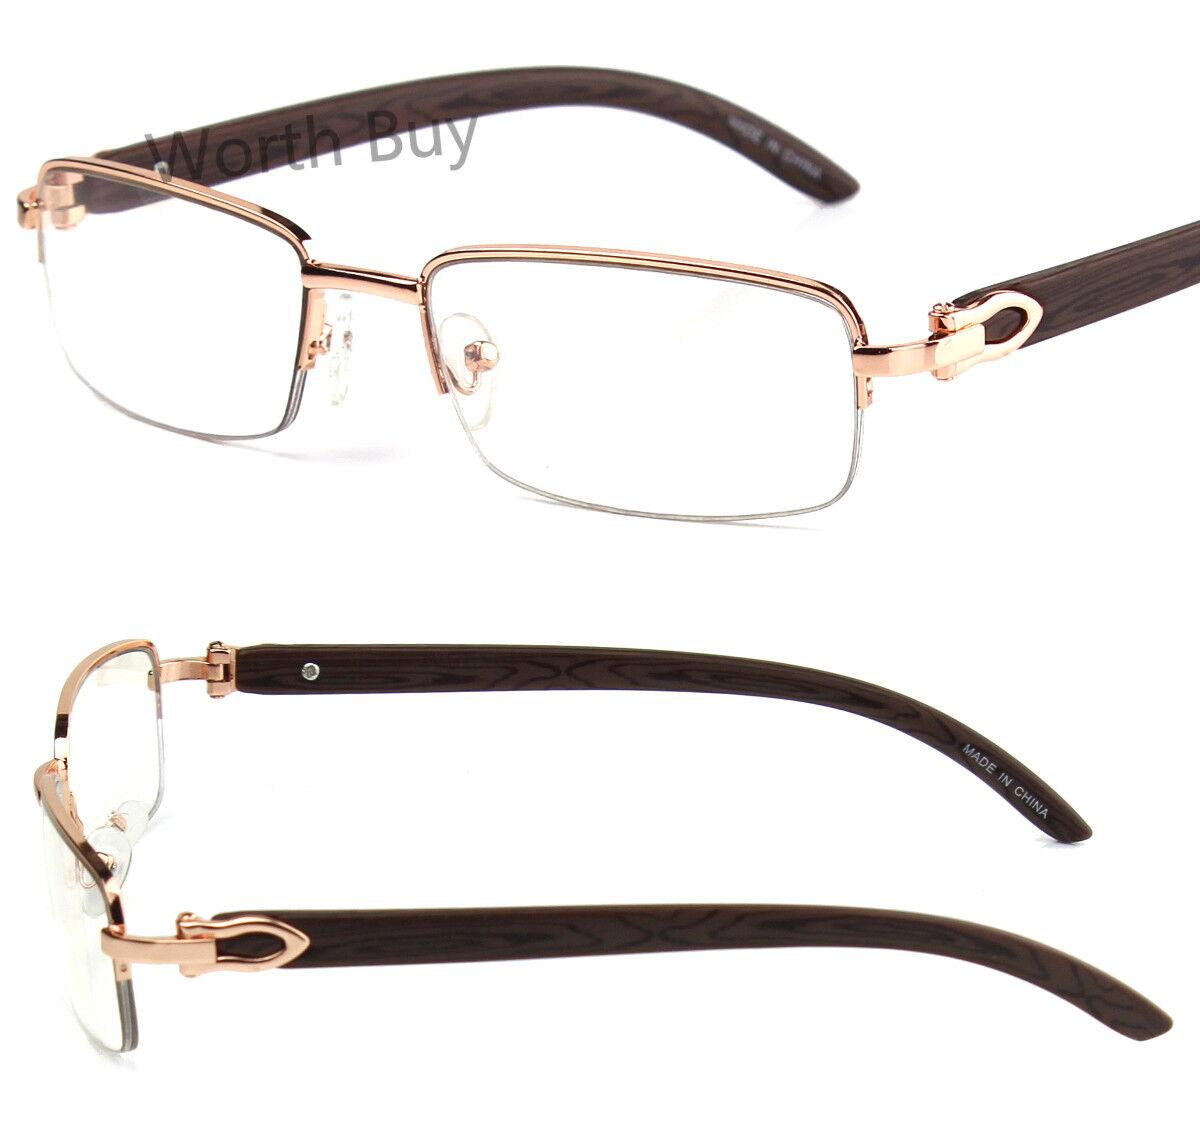 7f9f5105cd5f5 New Mens Women Clear Lens Frame Eye Glasses Old School Fashion Vintage  Retro 80s